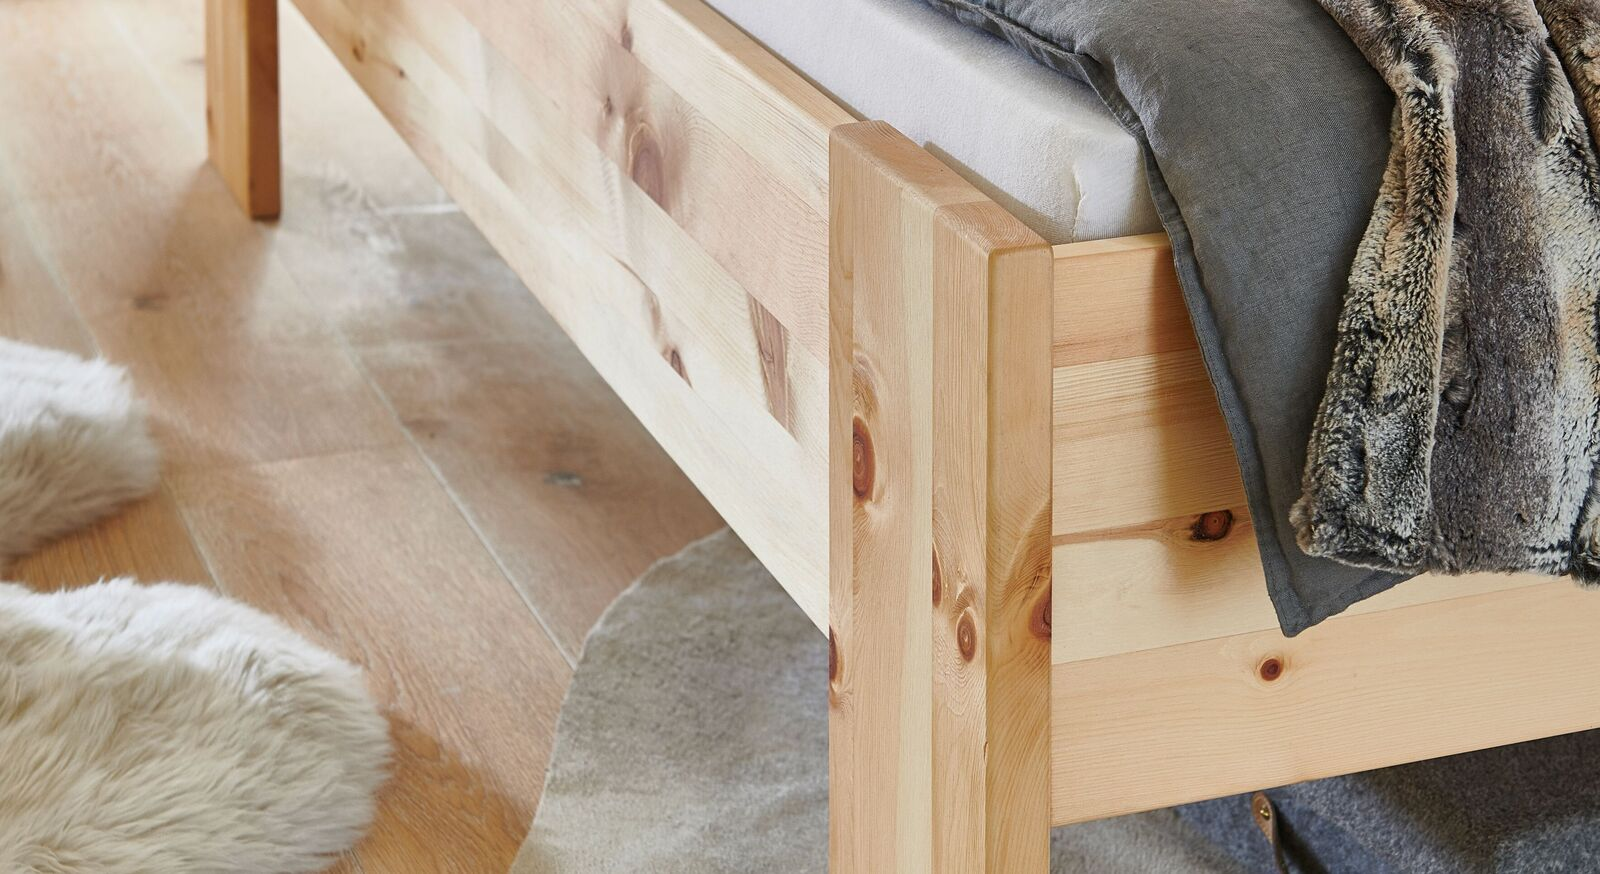 Zirbenholz-Bett mit massiven Holzfüßen